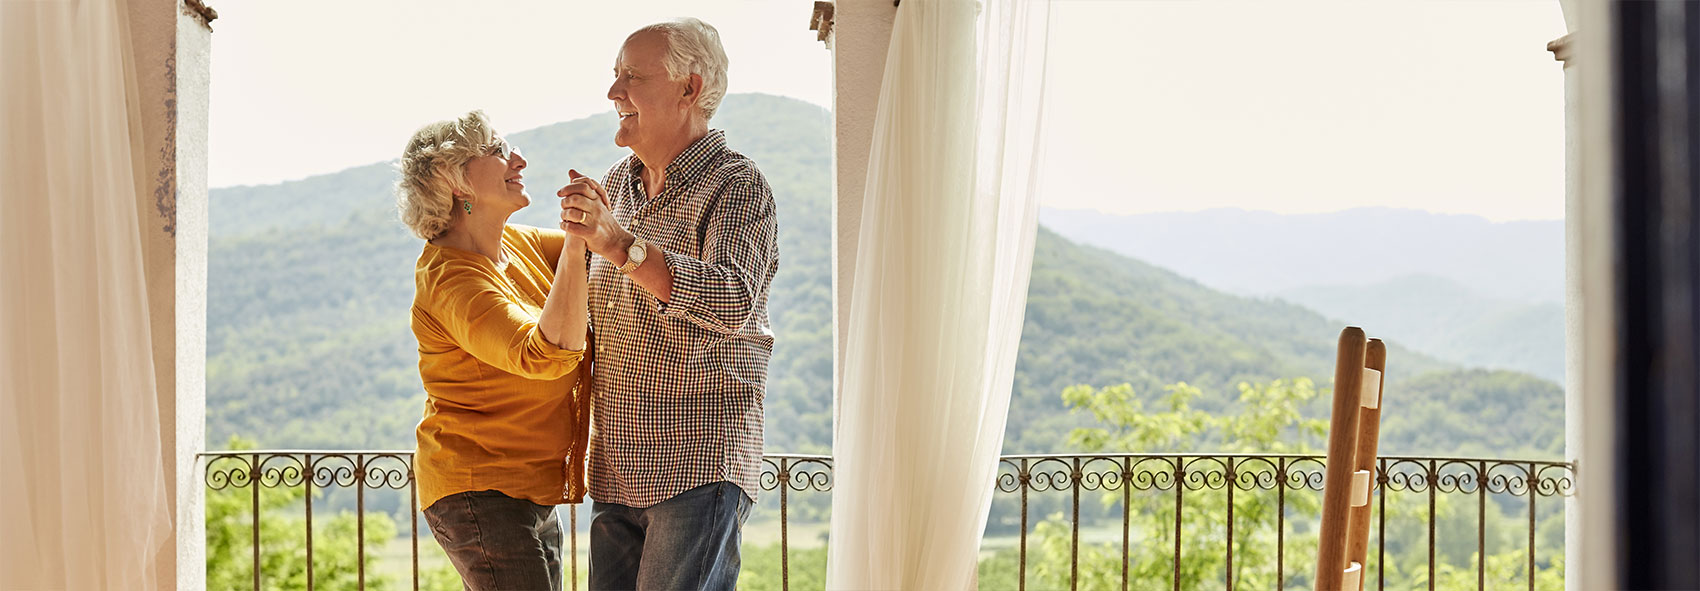 A senior couple dancing on a balcony